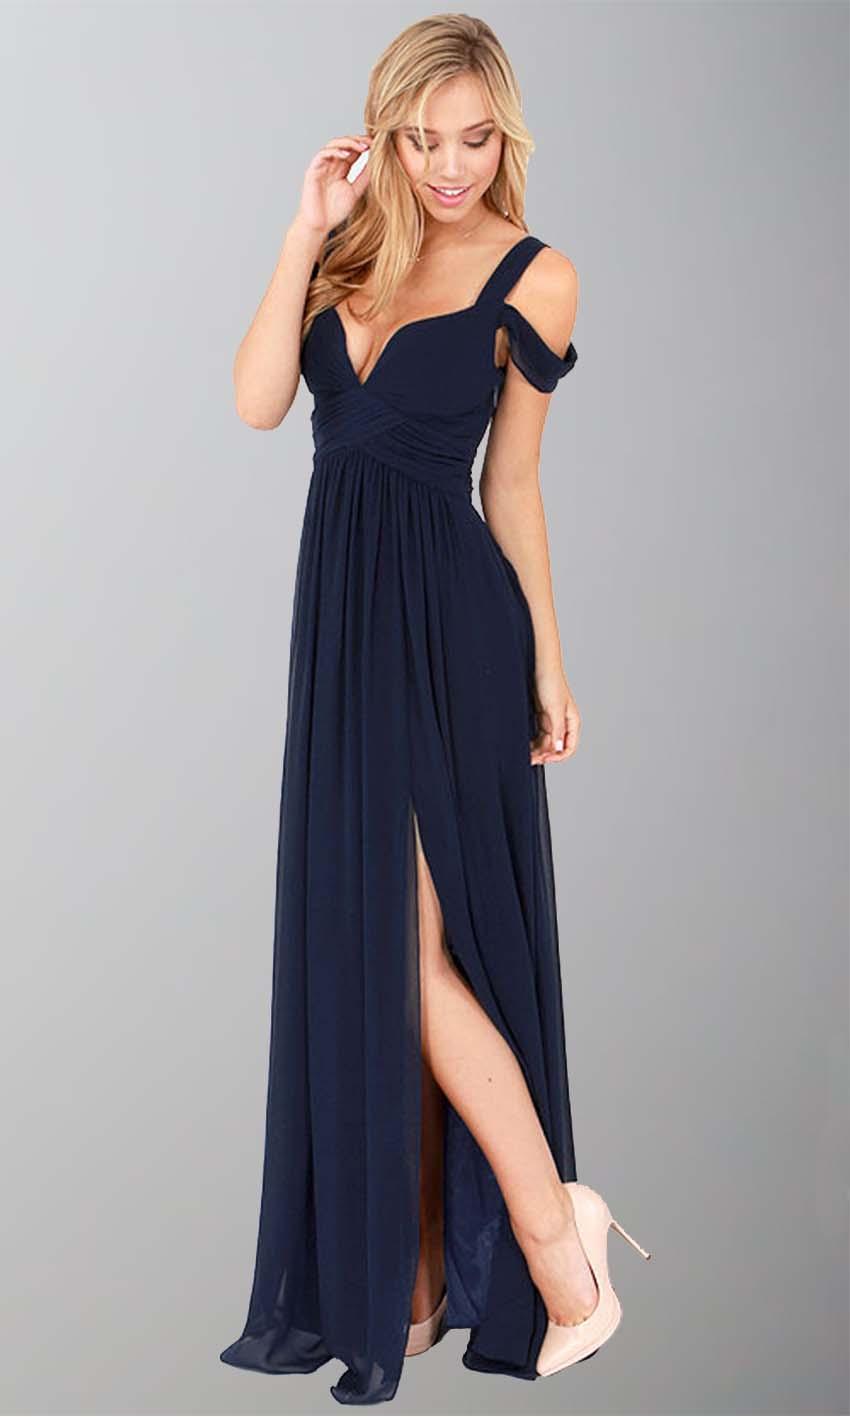 Off the shoulder dresses uk cheap